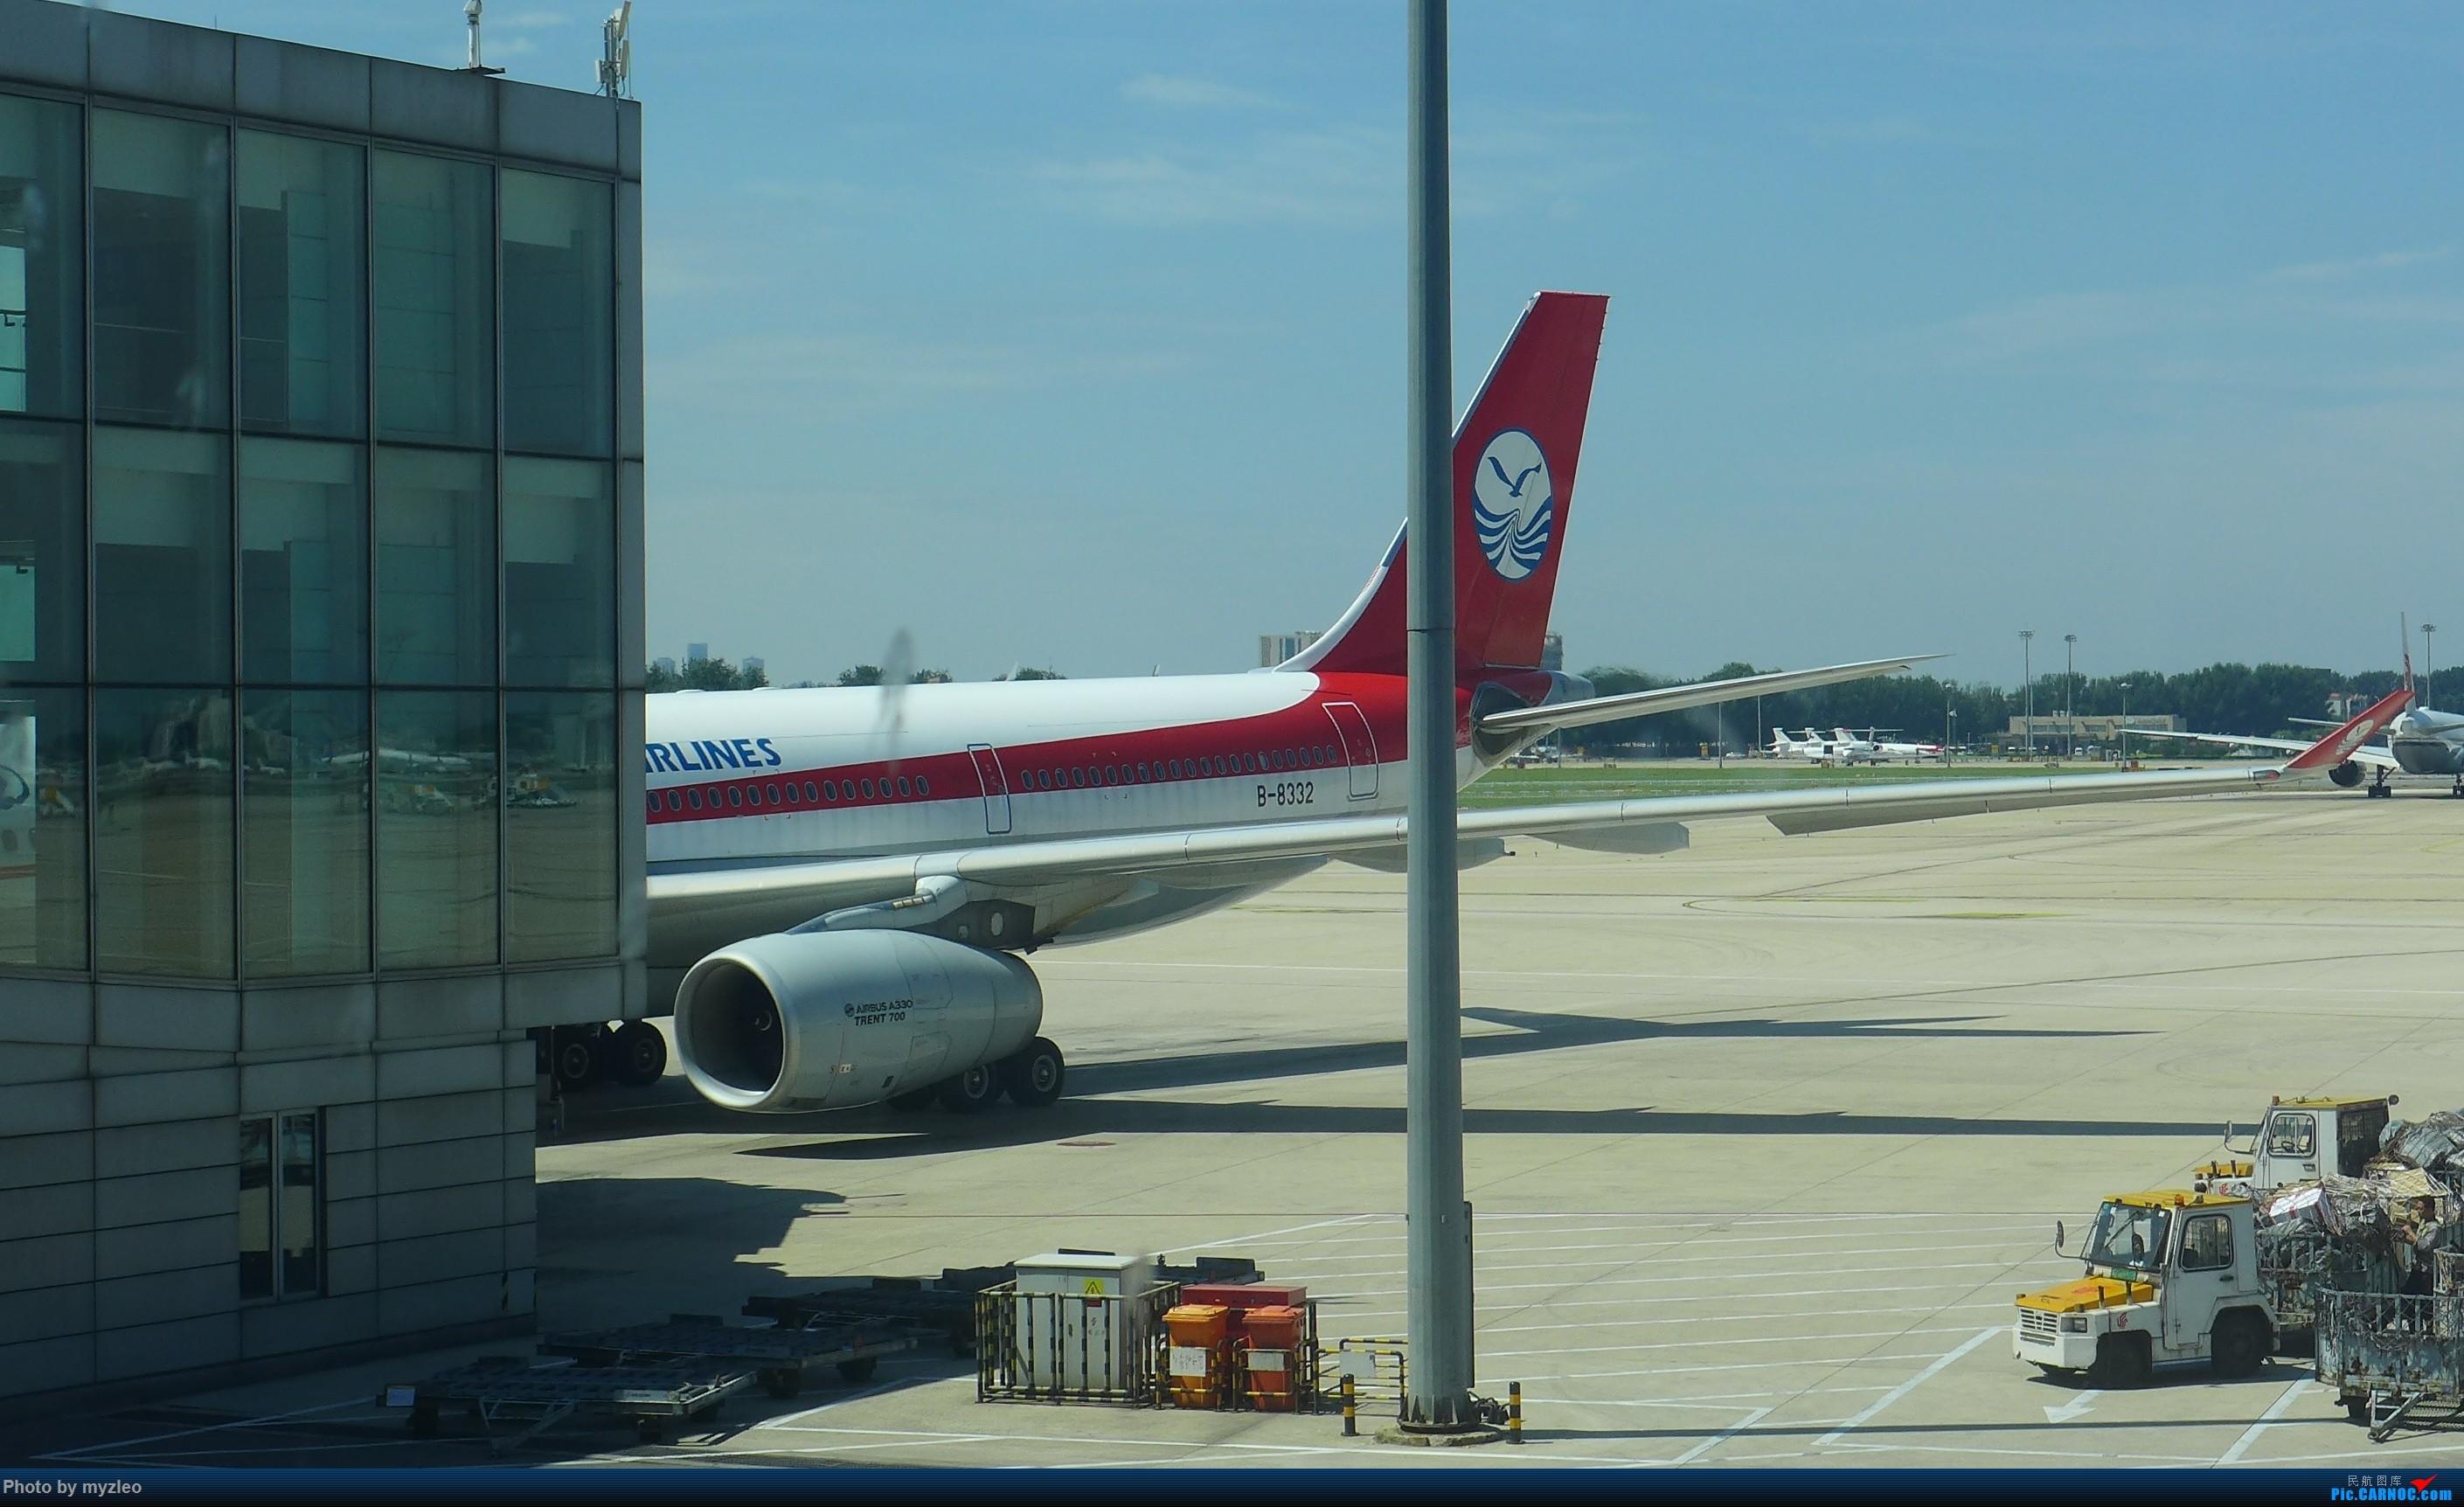 Re:[原创]【myzleo的游记3.1】三访帝都——记一次意外的惊喜,大鹅头初遇,第一次去中关村 AIRBUS A330-200 B-8332 中国北京首都国际机场